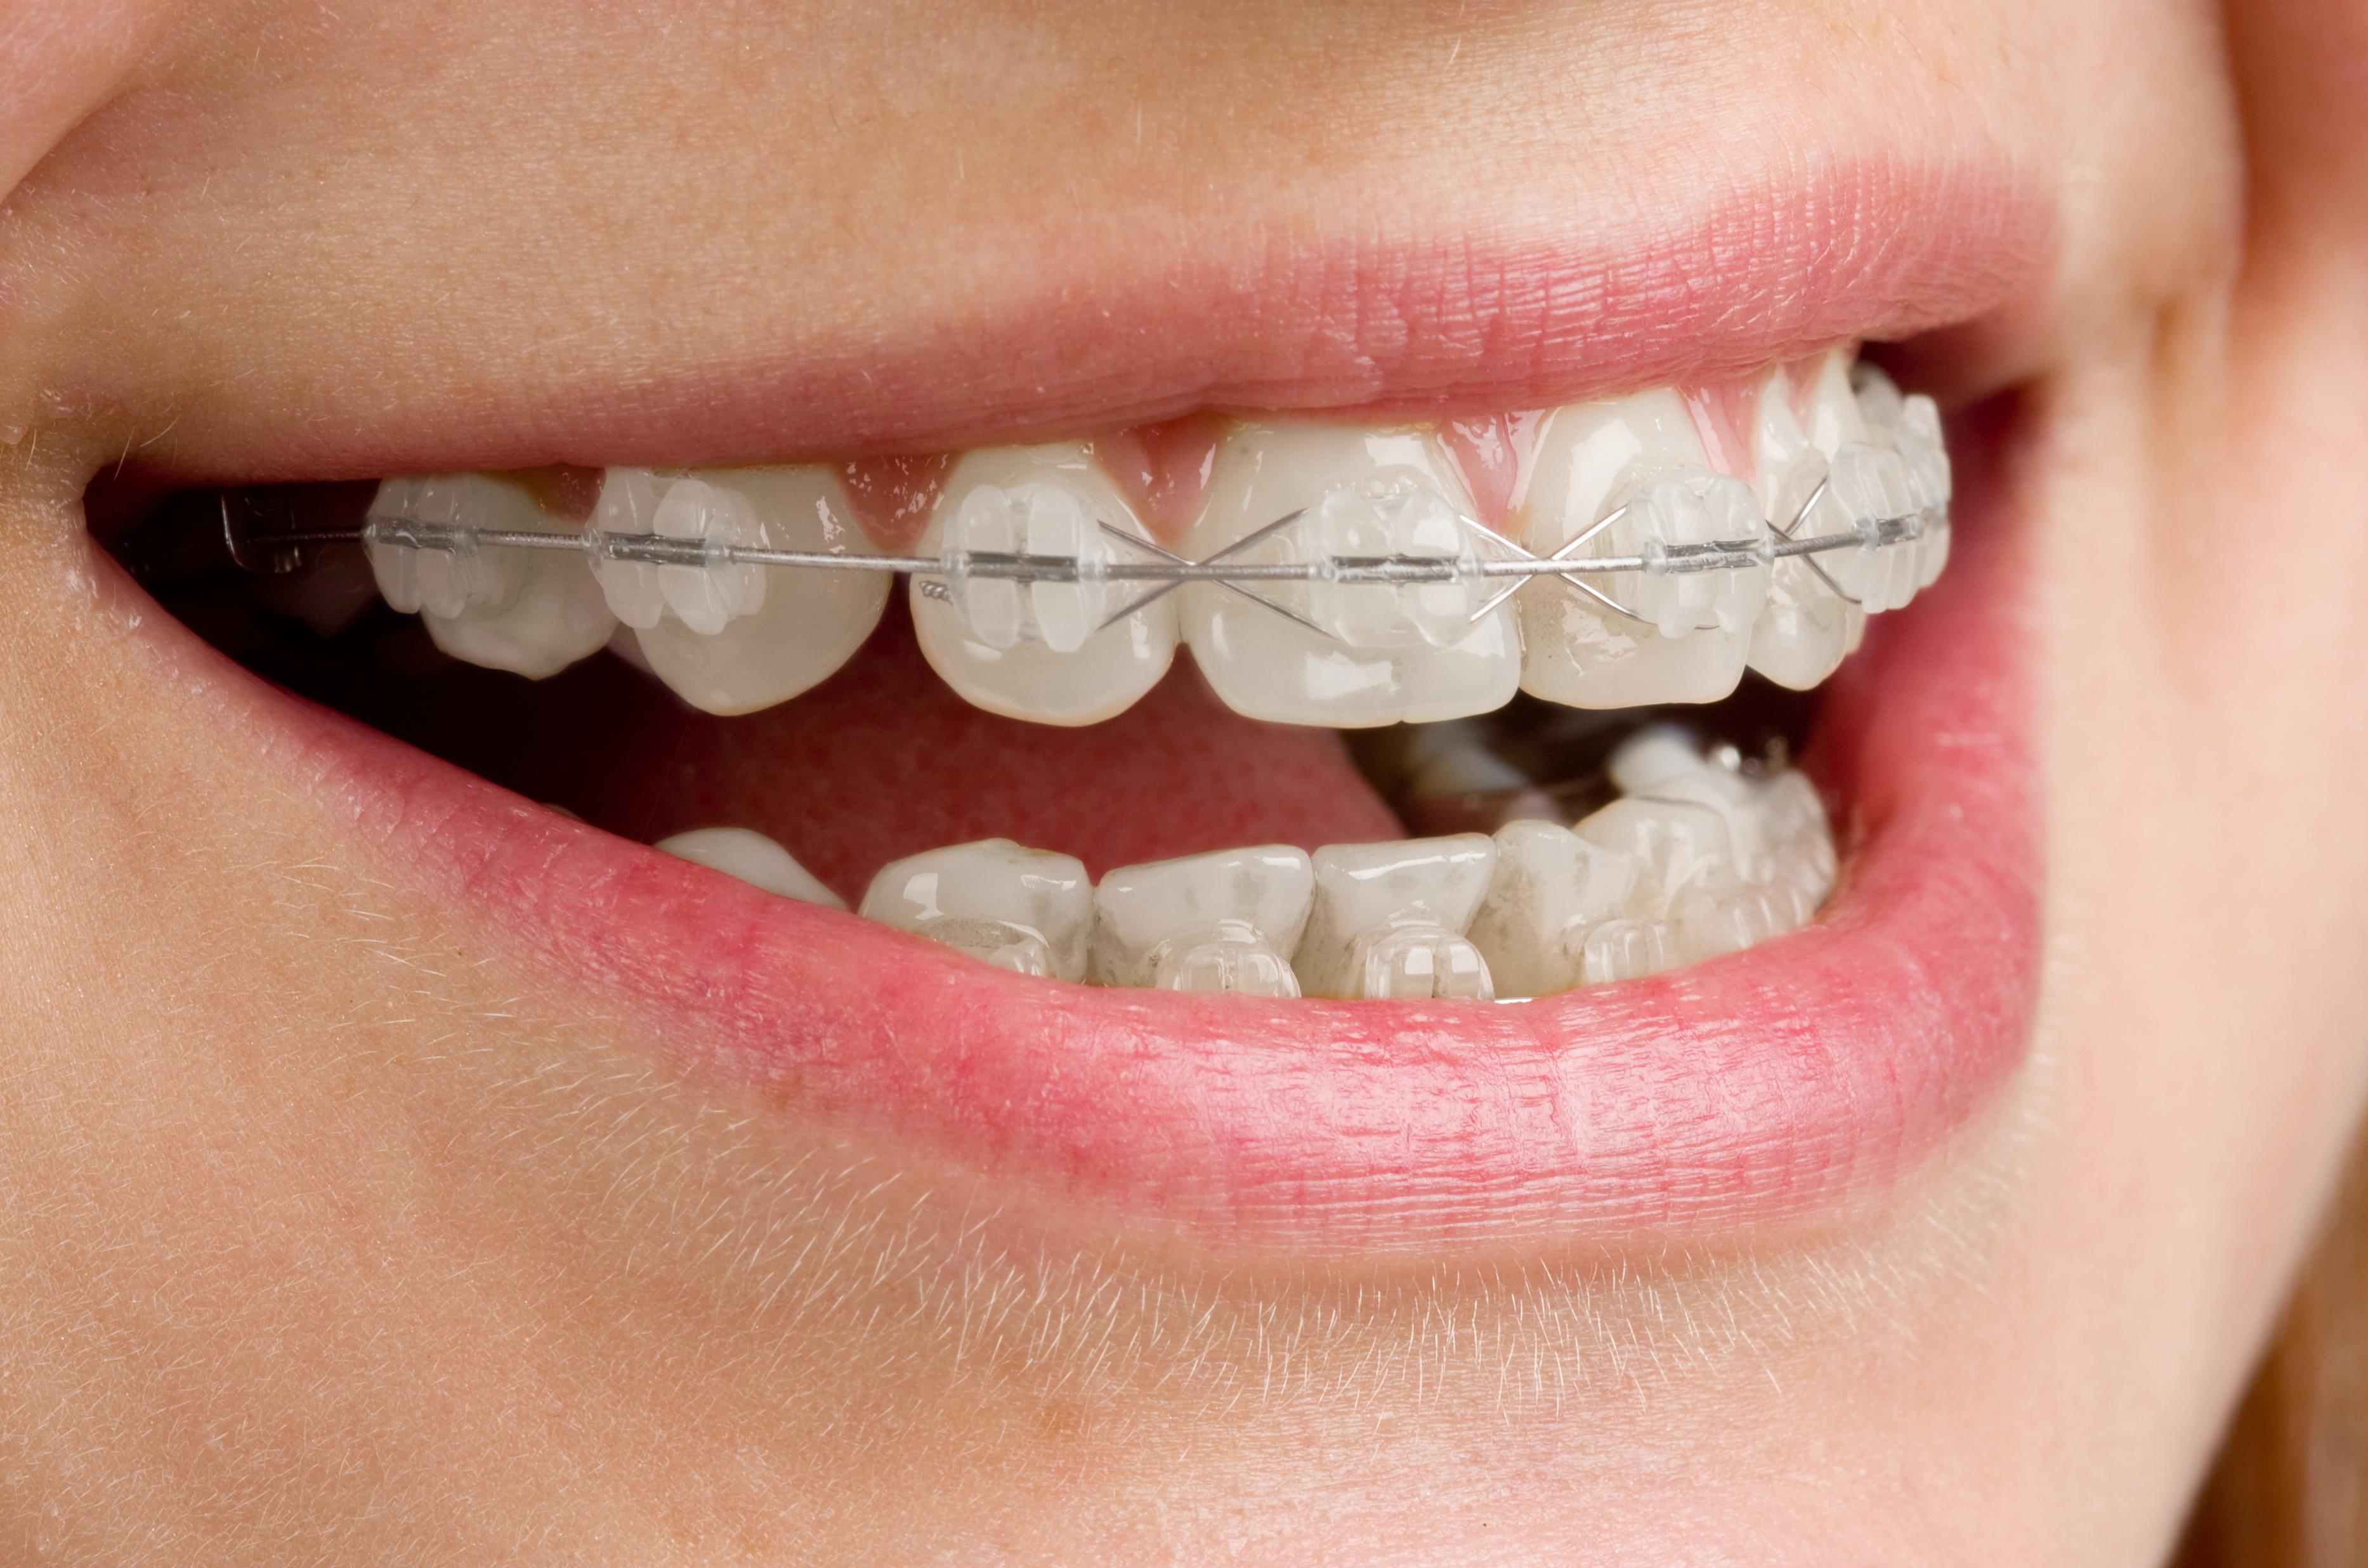 ortodoncia brackets estéticos en Clínica Dental Roca Santiago en Fuengirola, Málaga